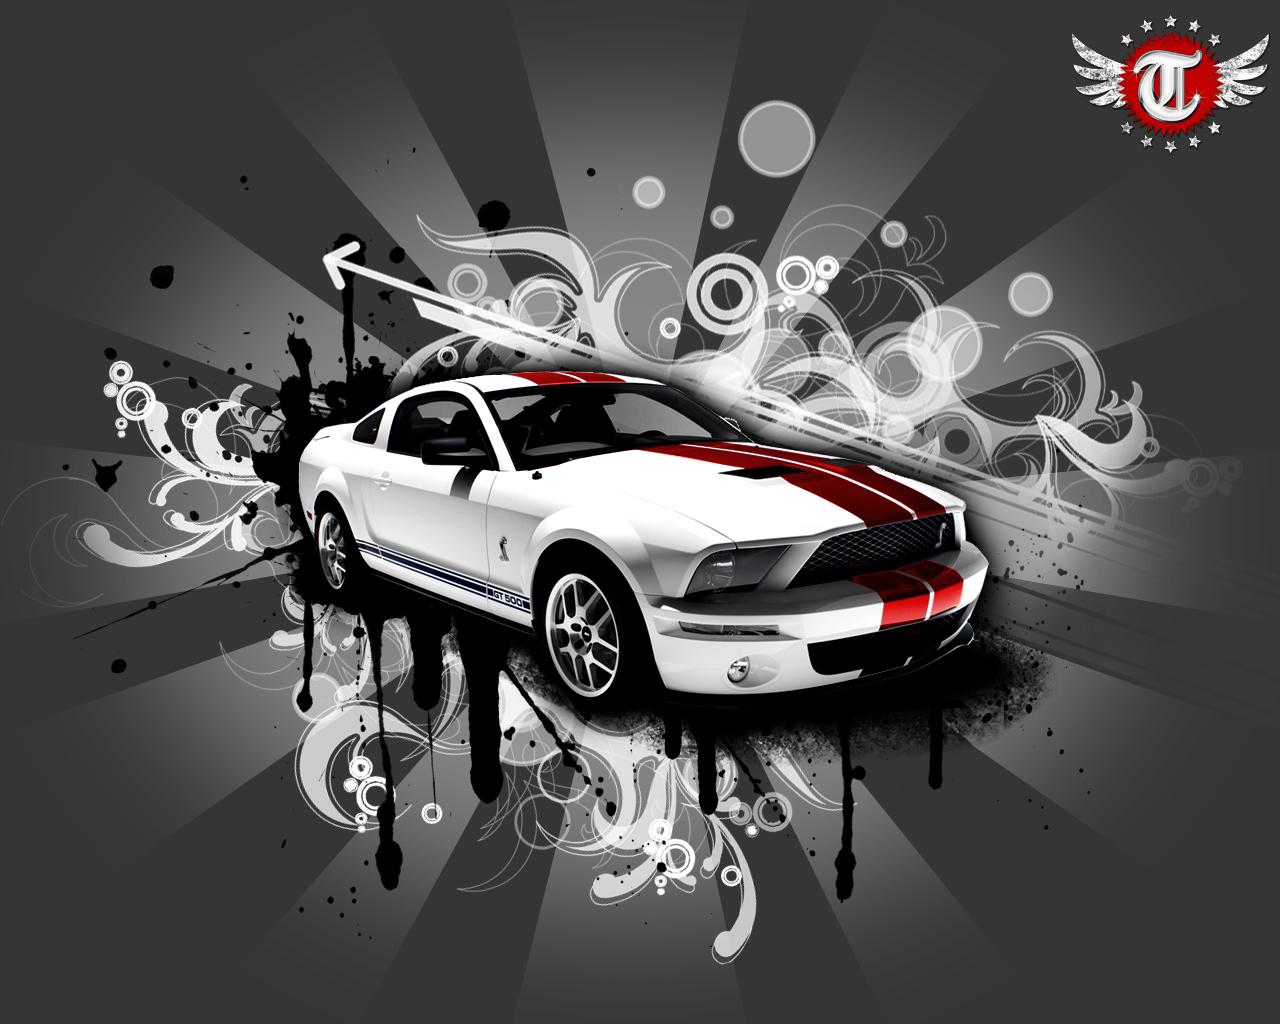 http://1.bp.blogspot.com/-ETgOjBmyQJw/TfLZMEADNkI/AAAAAAAAAUQ/Q7Wbnna4jIo/s1600/Mustang_GT500_Wallpaper_by_tomson.jpg